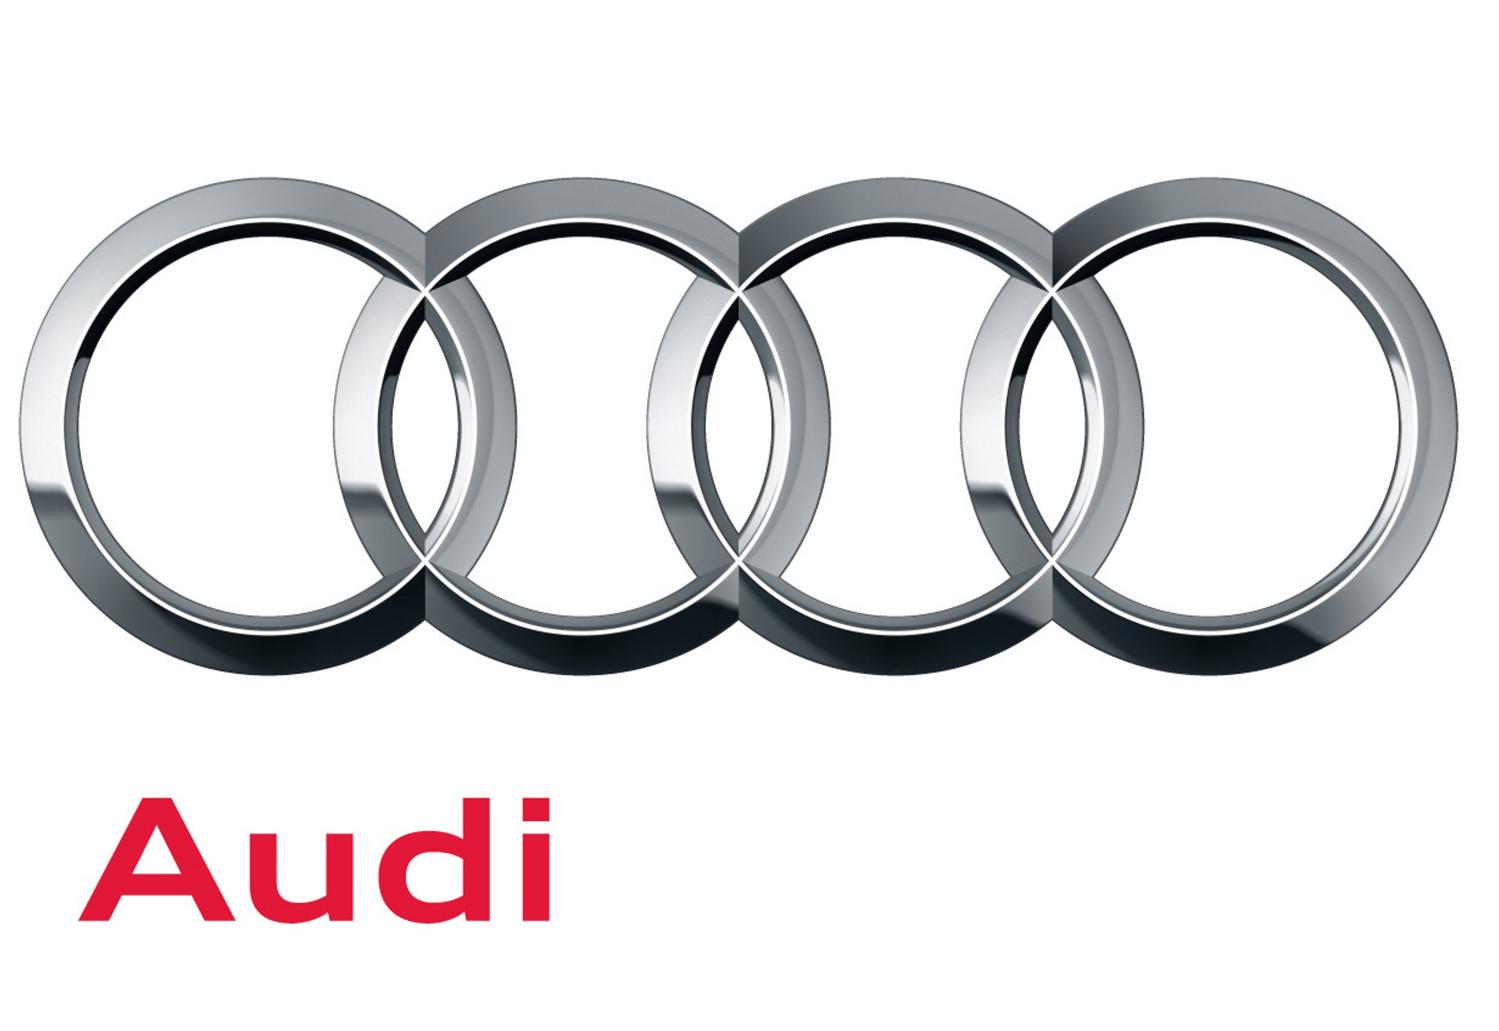 2009-current-Audi-logo-emblem.jpg